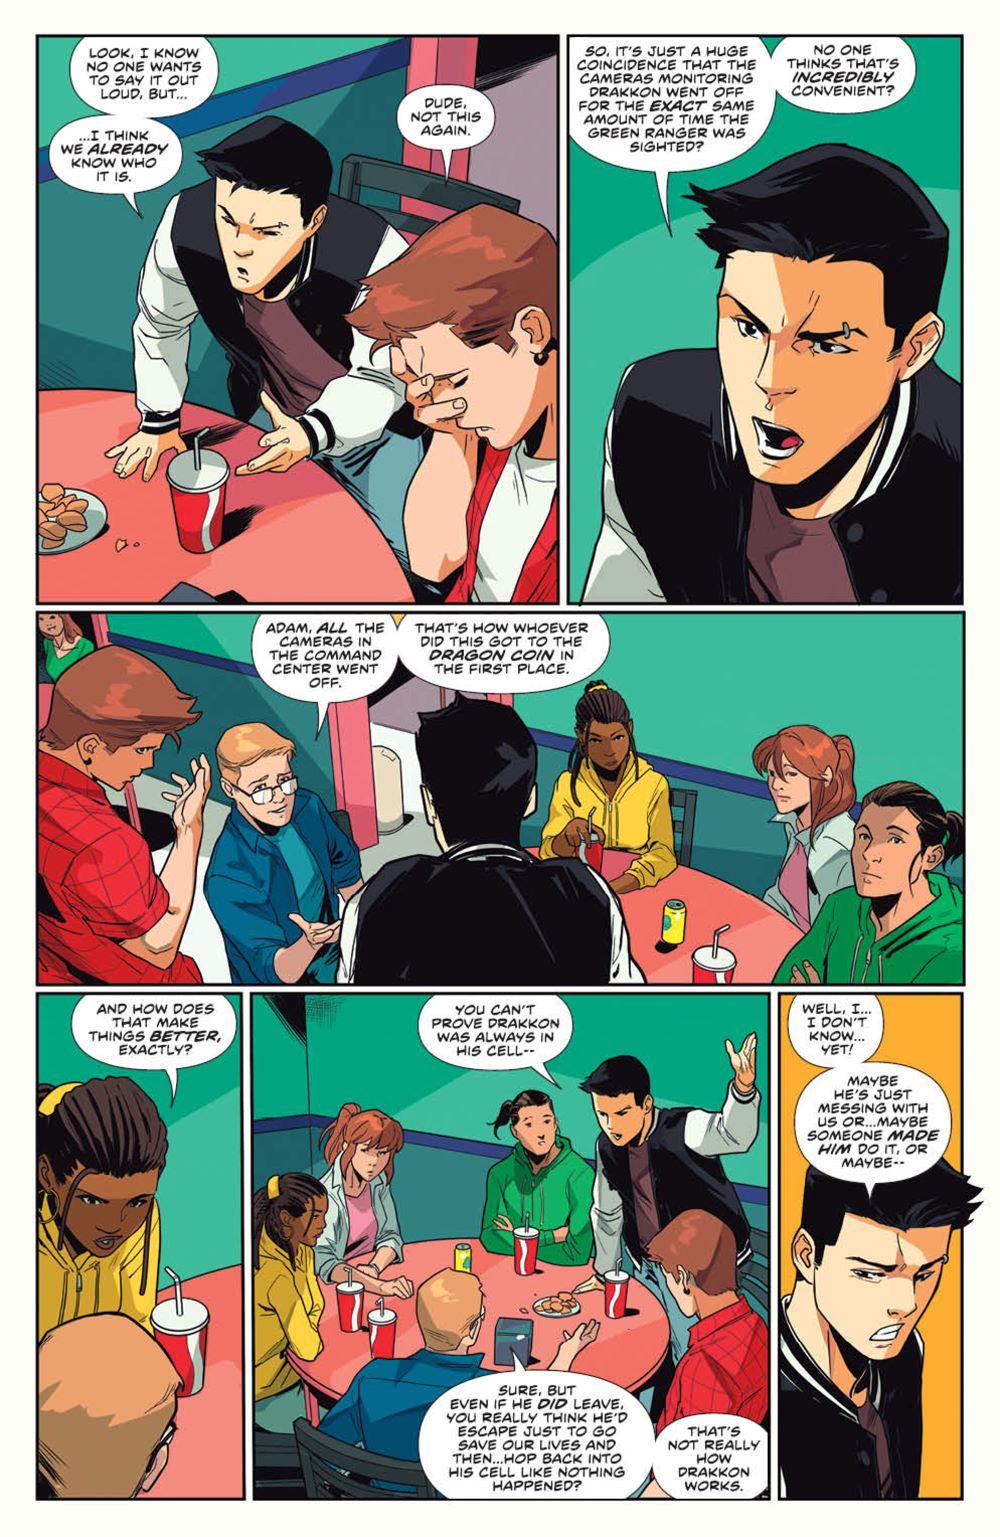 MightyMorphin_v1_SC_PRESS_13 ComicList Previews: MIGHTY MORPHIN VOLUME 1 TP